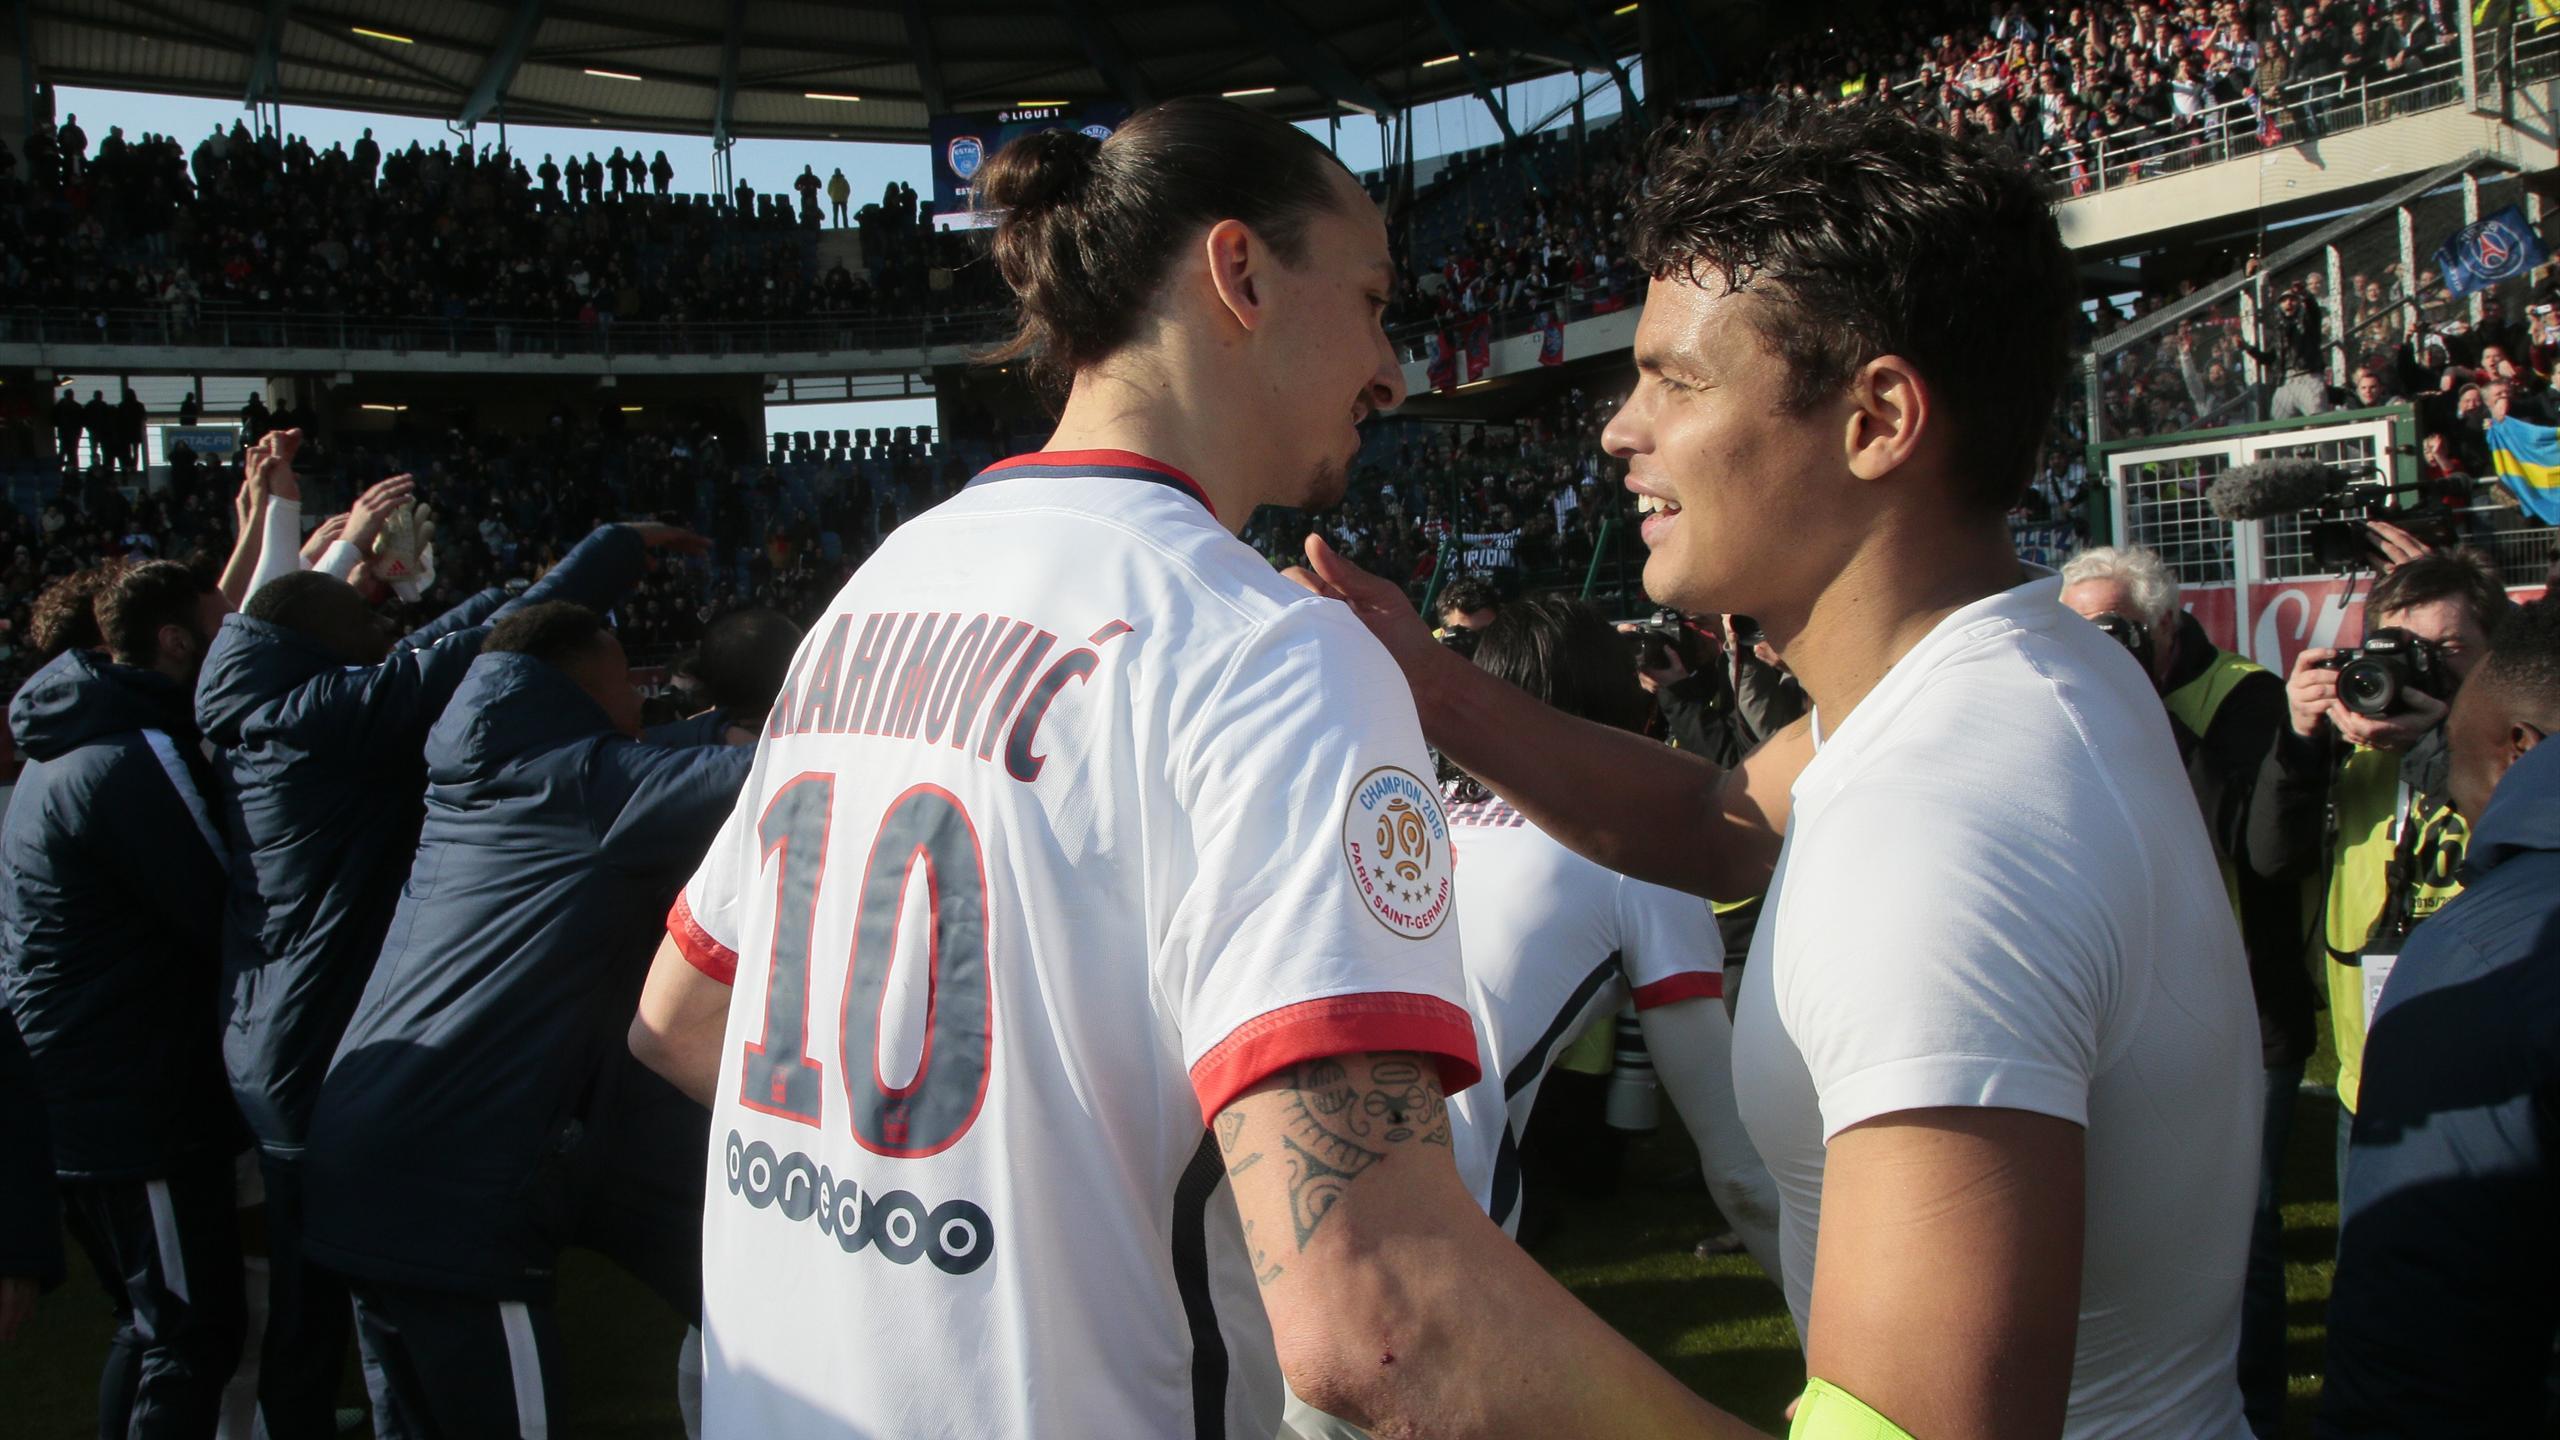 Paris Saint-Germain's Brazilian defender Thiago Silva (R) celebrates with Swedish forward Zlatan Ibrahimovic